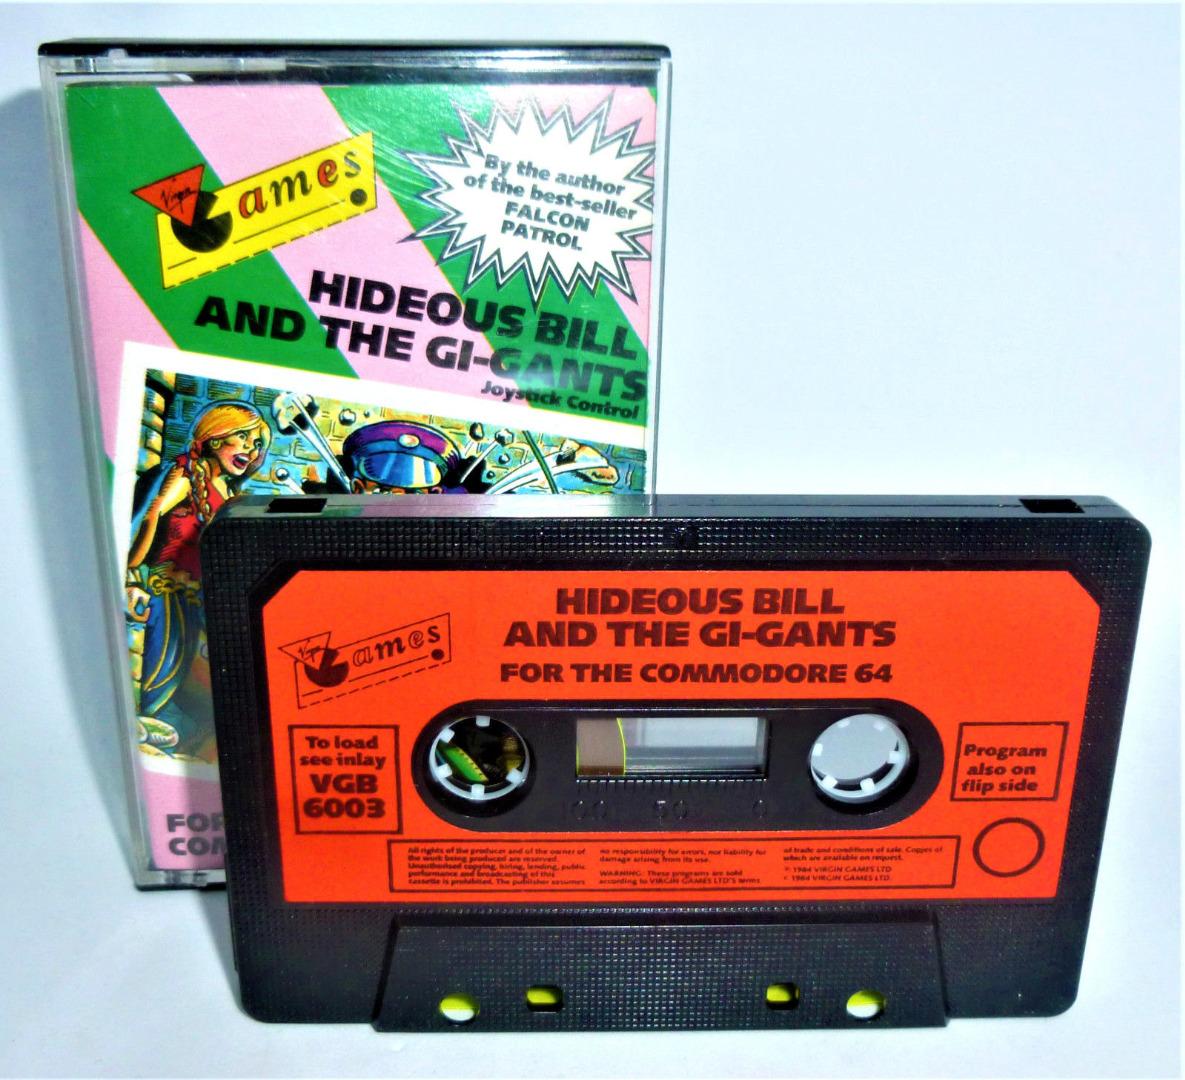 C64 Hideous Bill and the Gi-Gants - 2